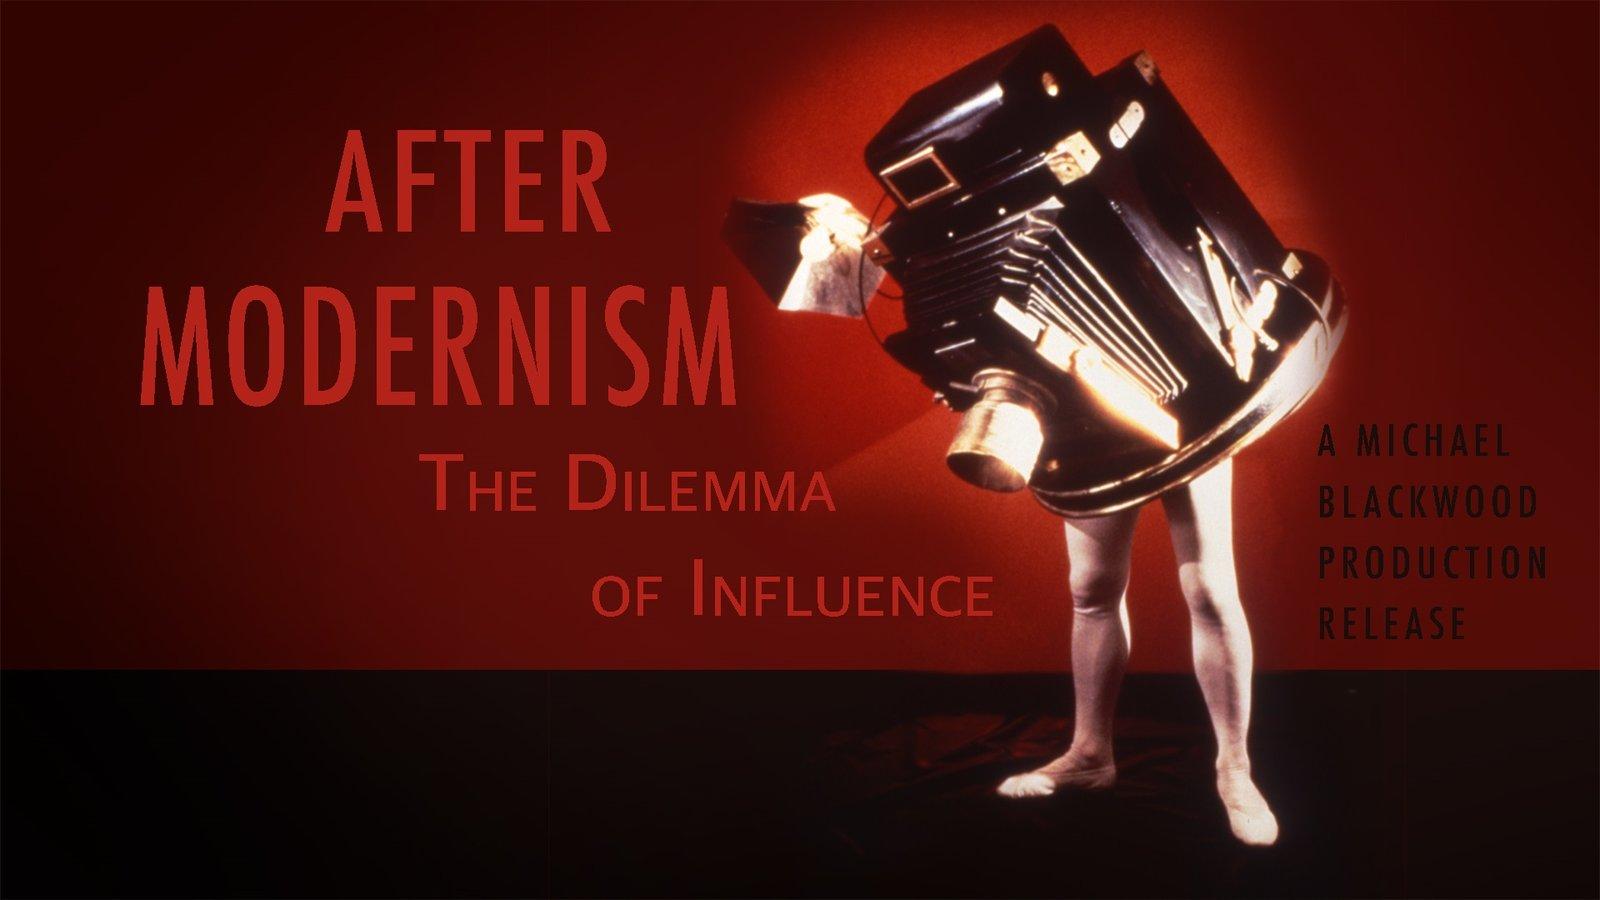 After Modernism - The Dilemma of Influence